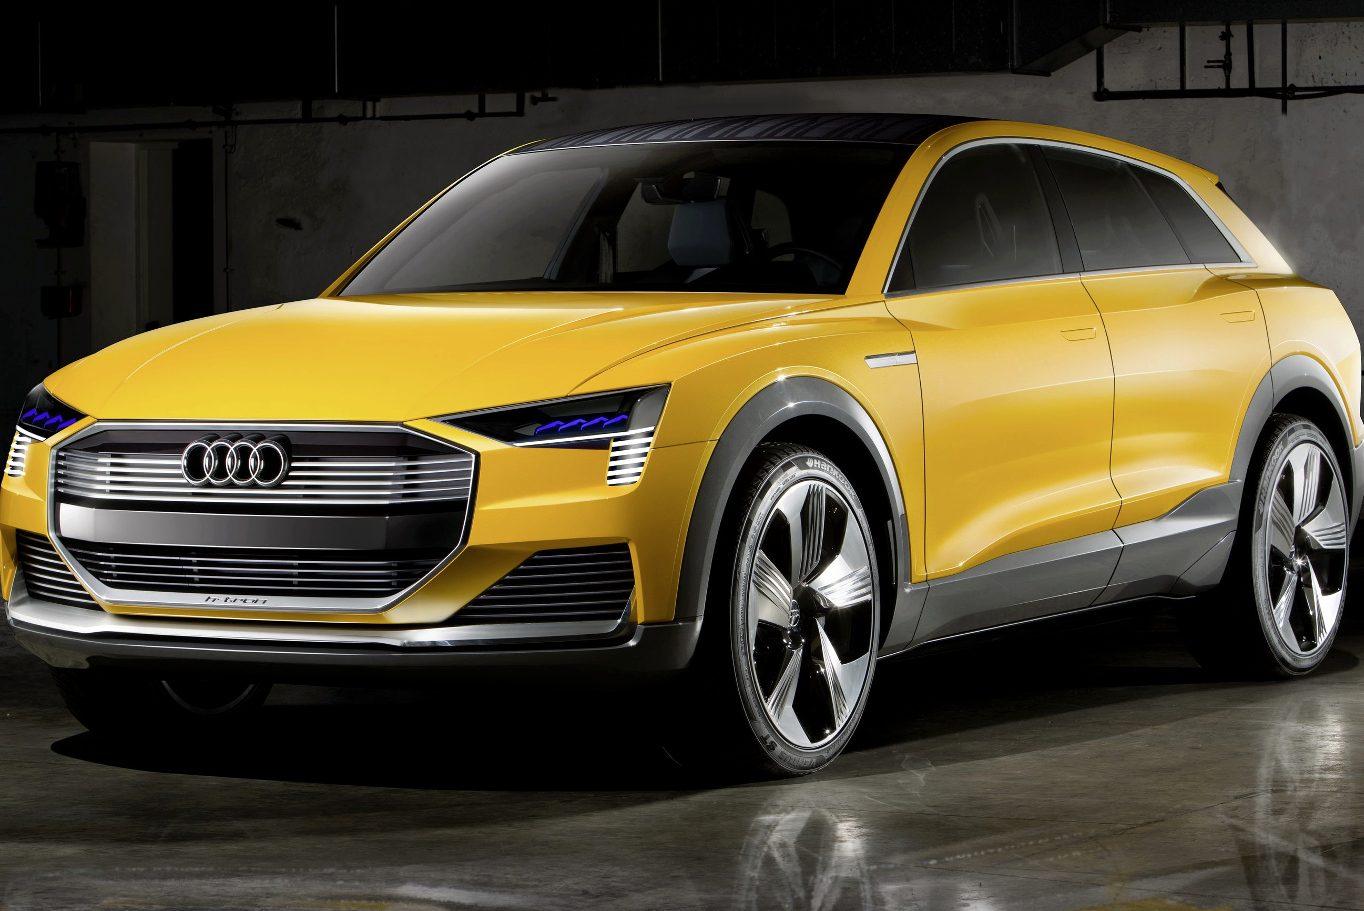 Vodíkové auto